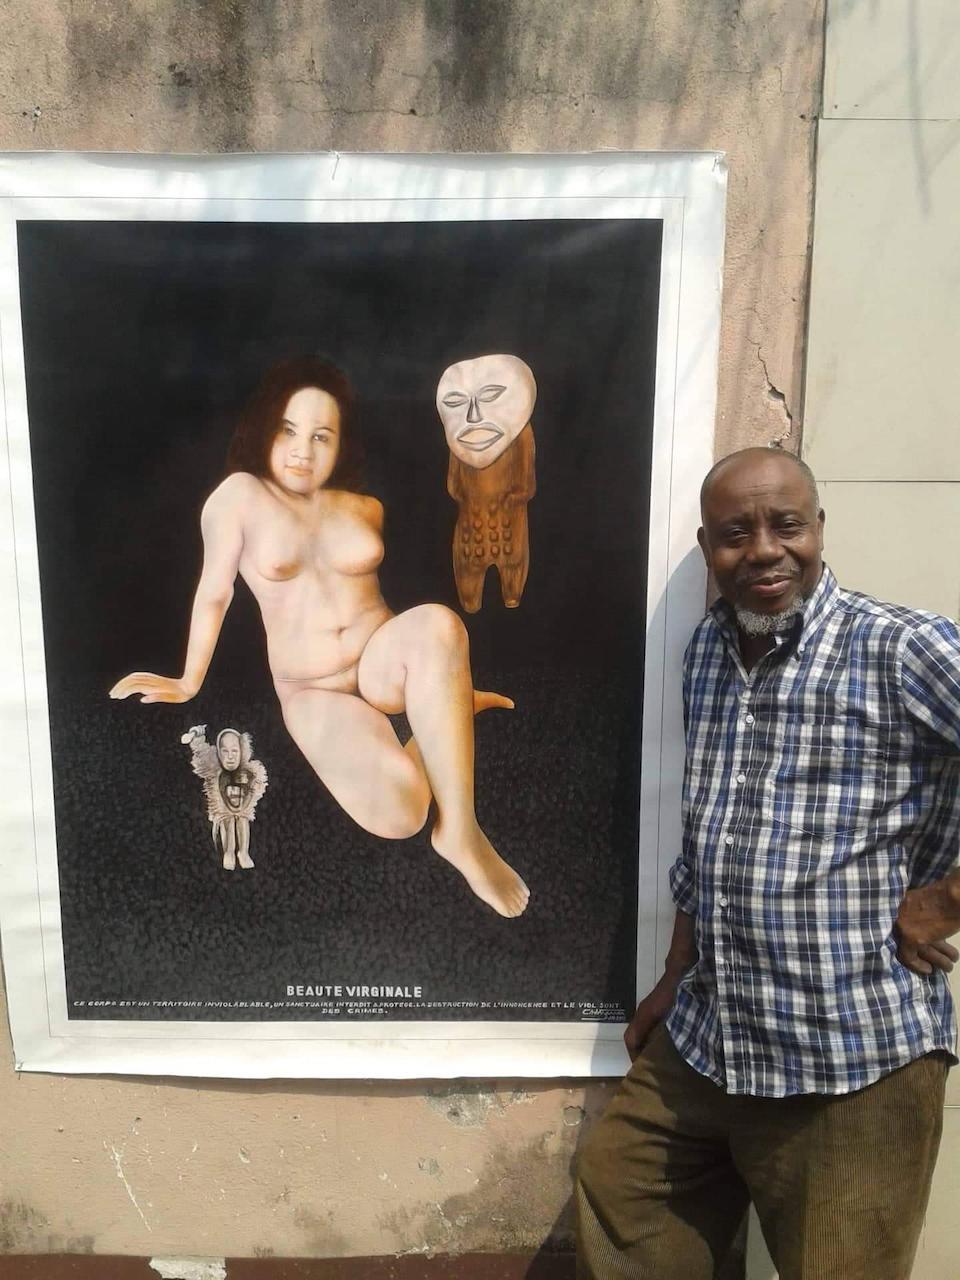 Chéri Samba (Democratic Republic of Congo, born 1956) Beauté Virginale unframed and unstretched.